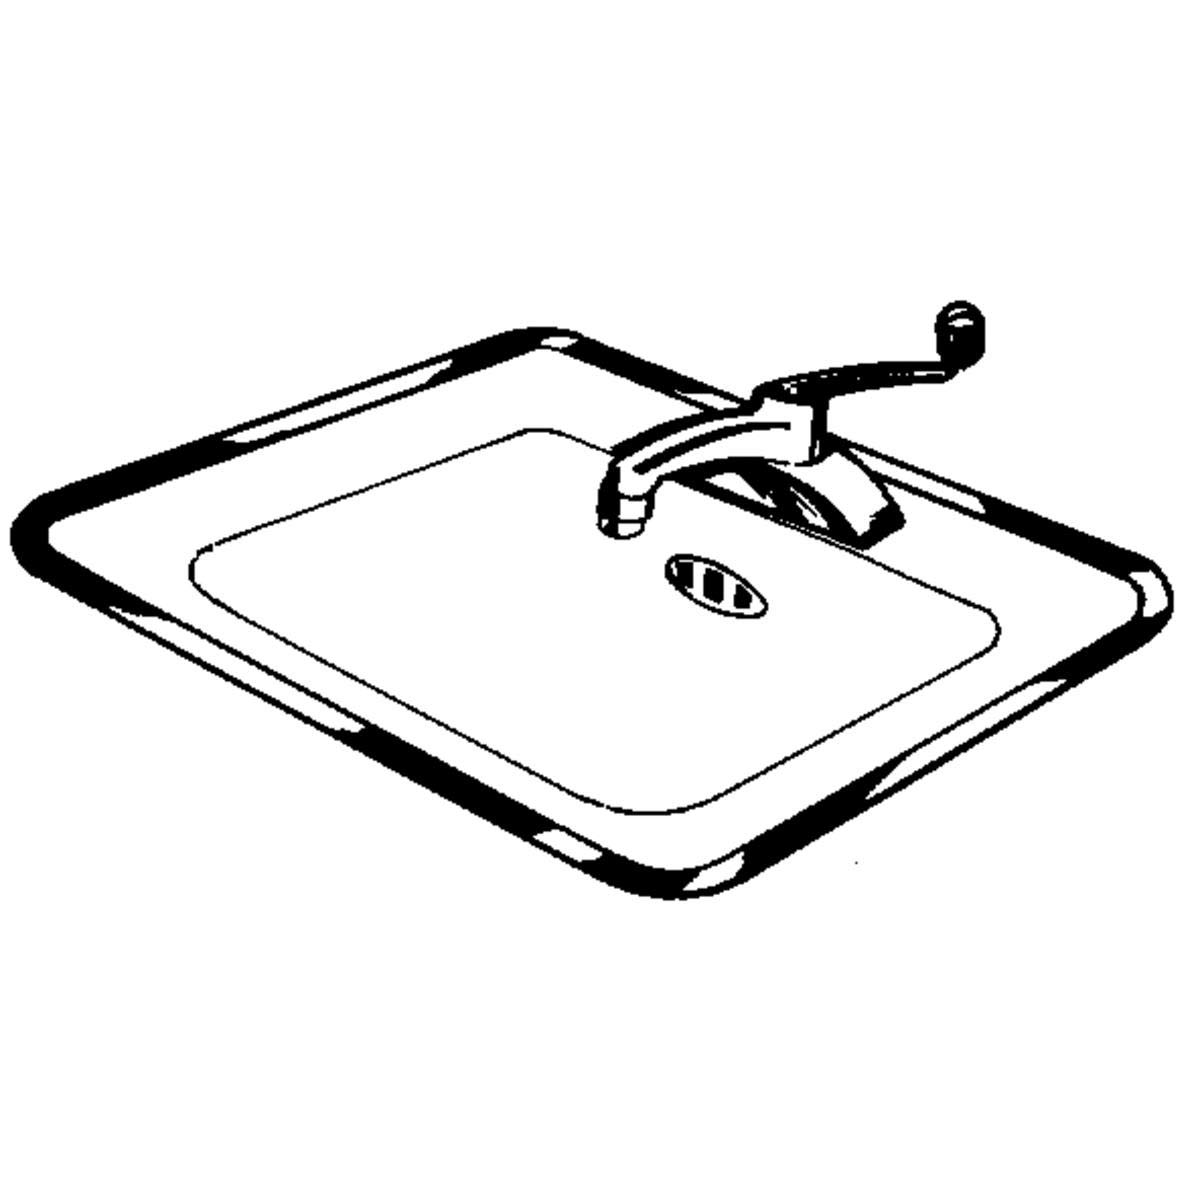 Vance Stainless Steel Sink Frame (Hudee Rim) for 21 X 32 inch rectangular sink, 1S42132S